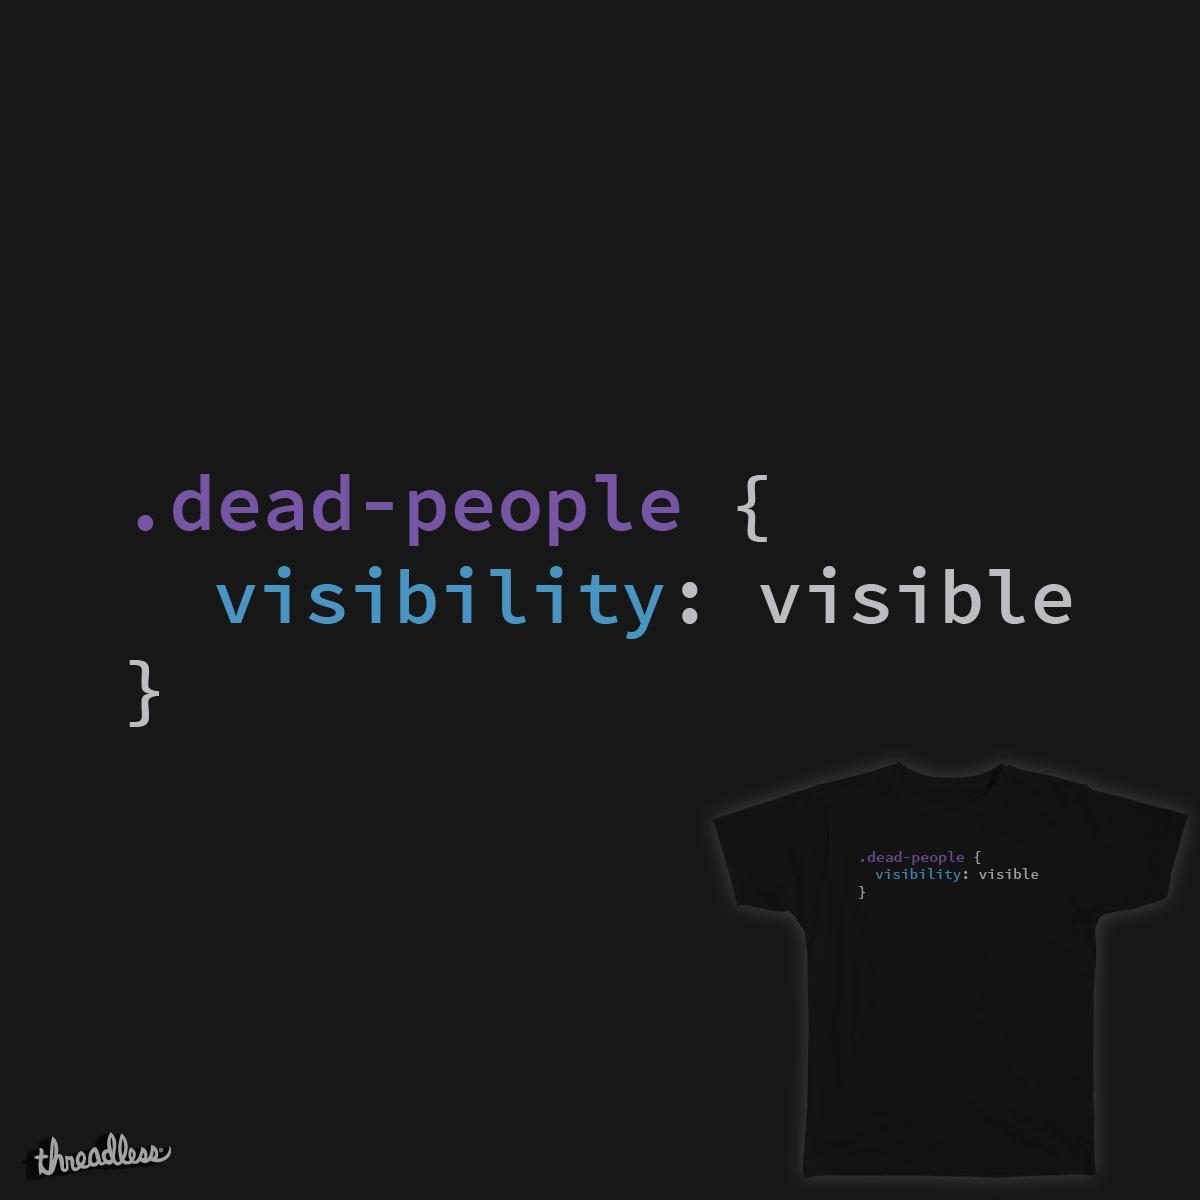 I CSS Dead People by cristofercruz on Threadless